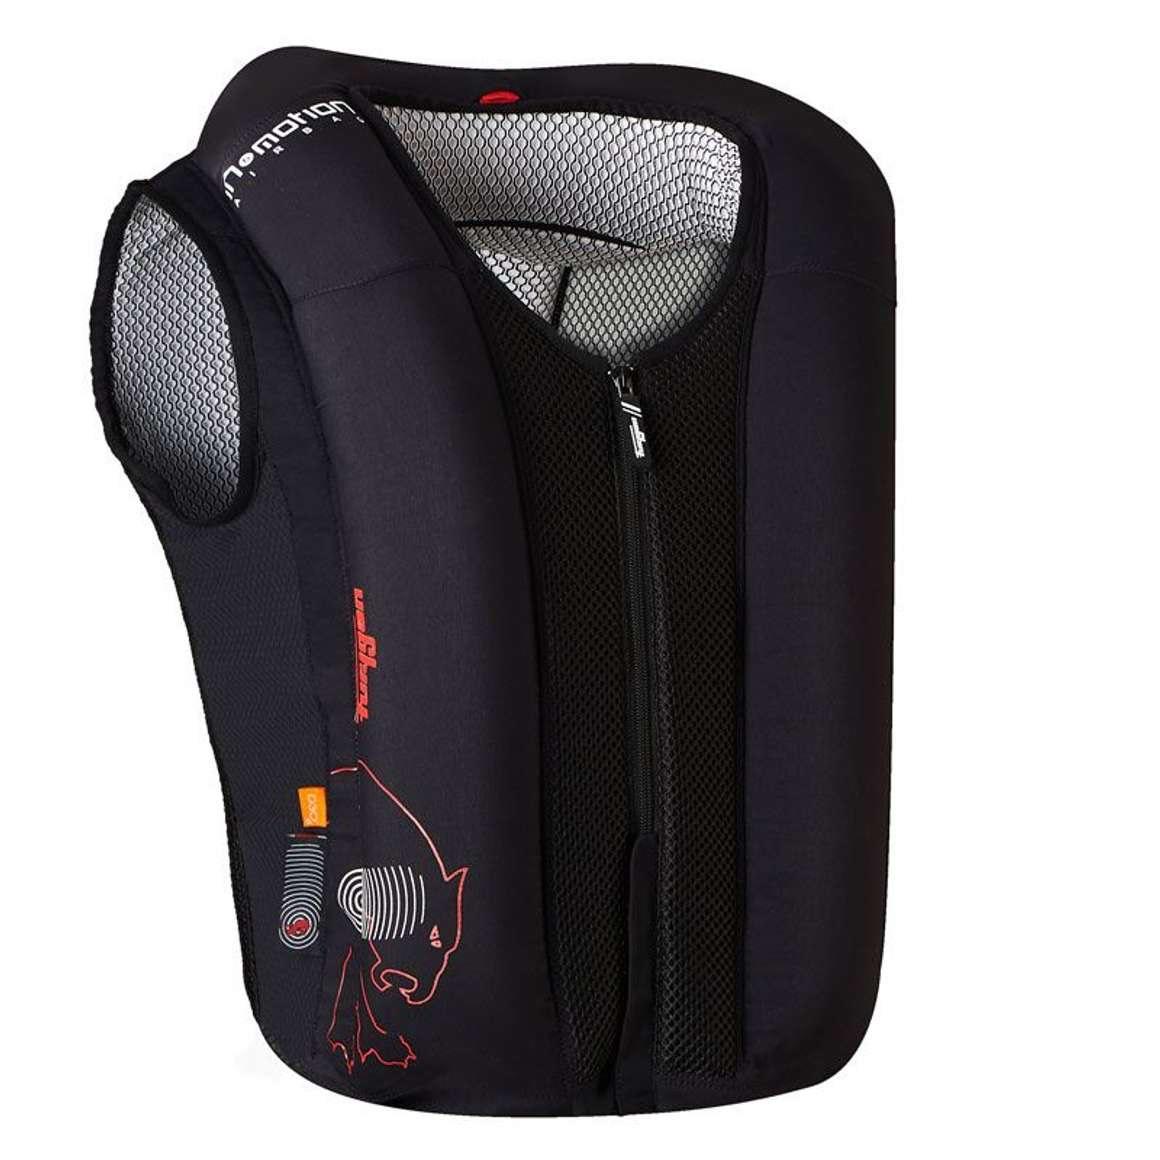 Gilet Airbag Furygan Fury Airbag System